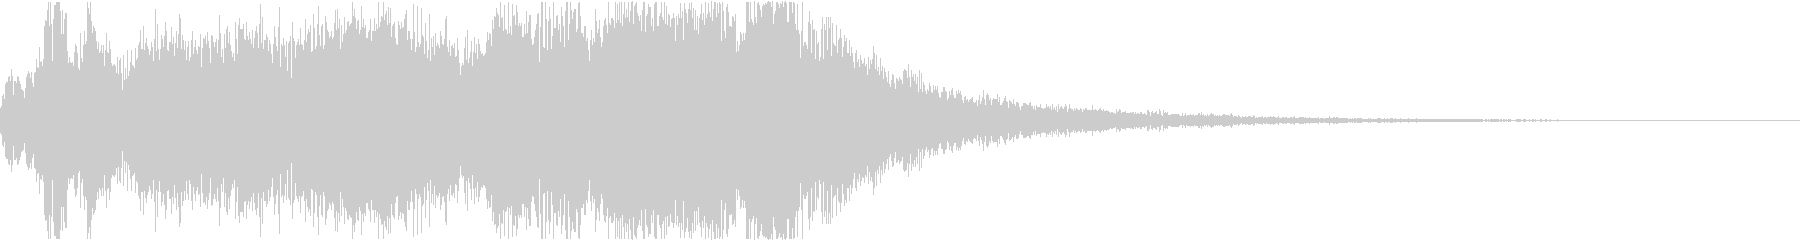 OPのような場面転換に使えるオーケストラの未再生の波形